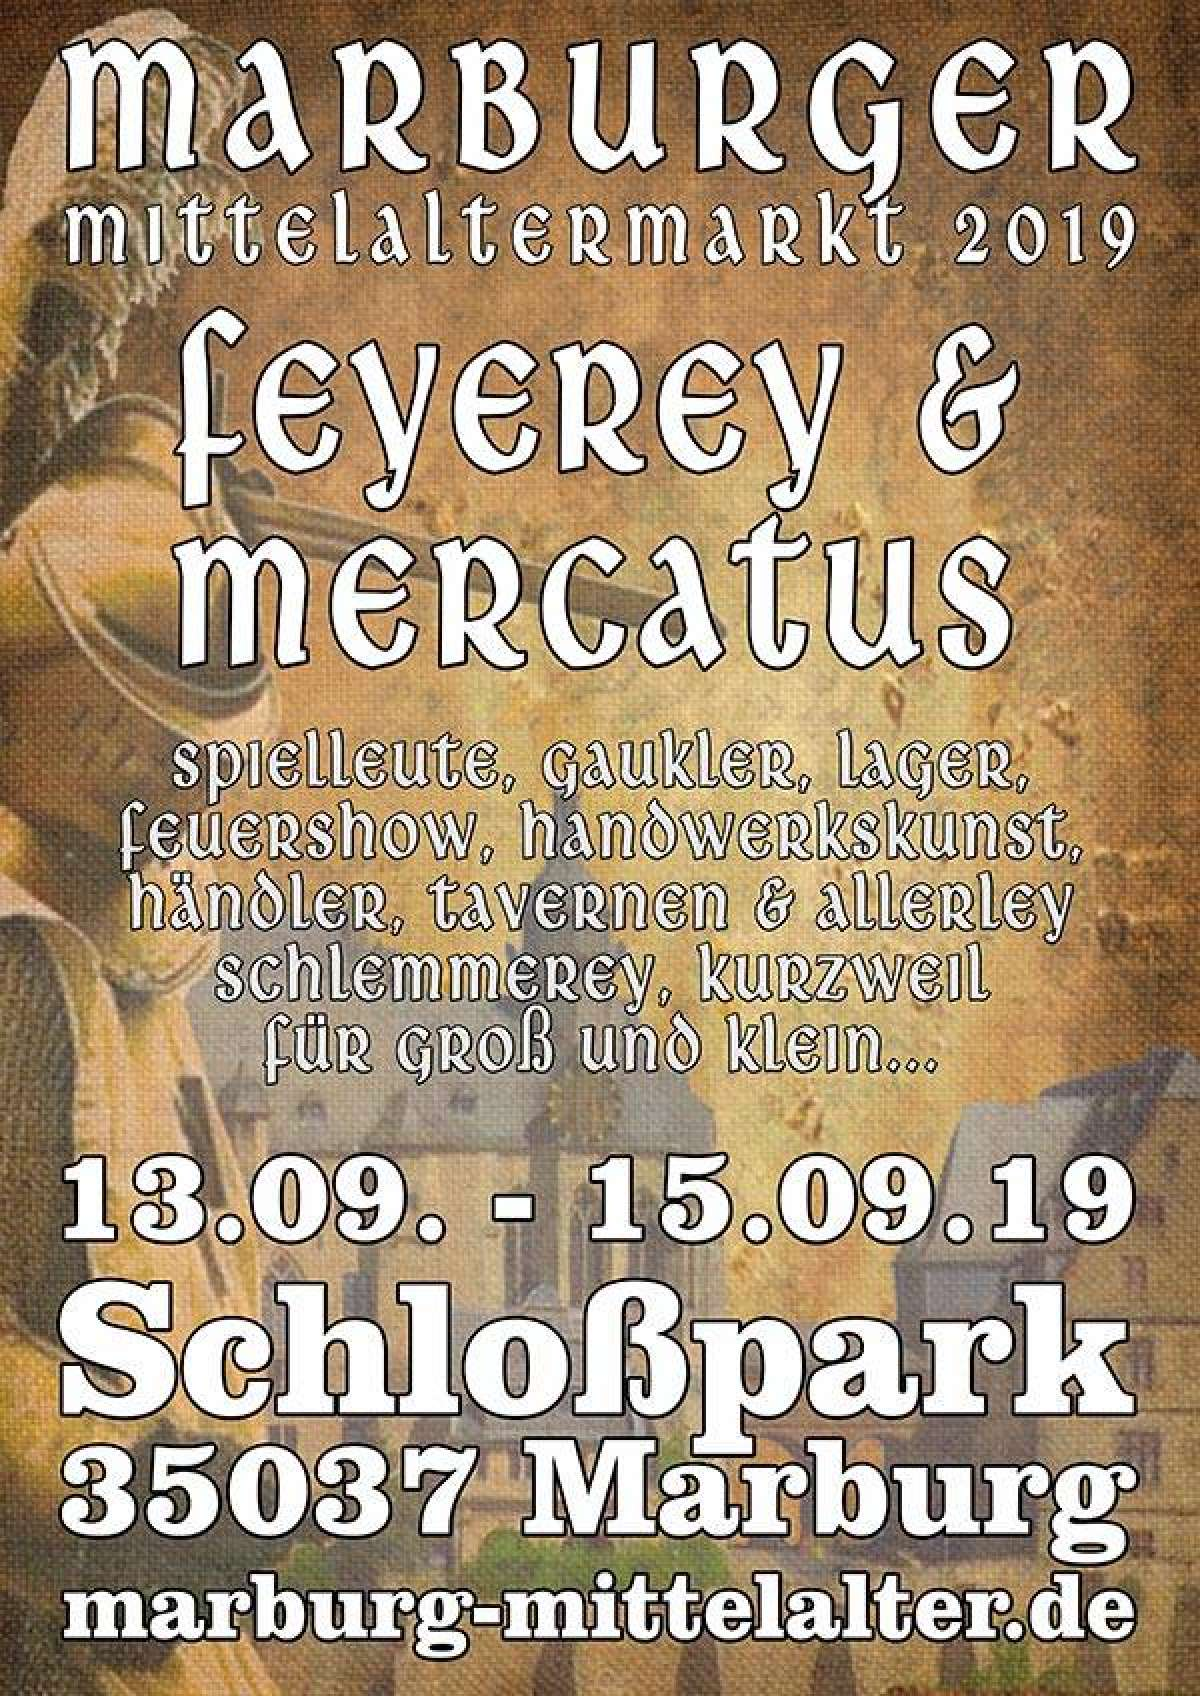 Marburger Mittelaltermarkt Feyerey & Mercatus